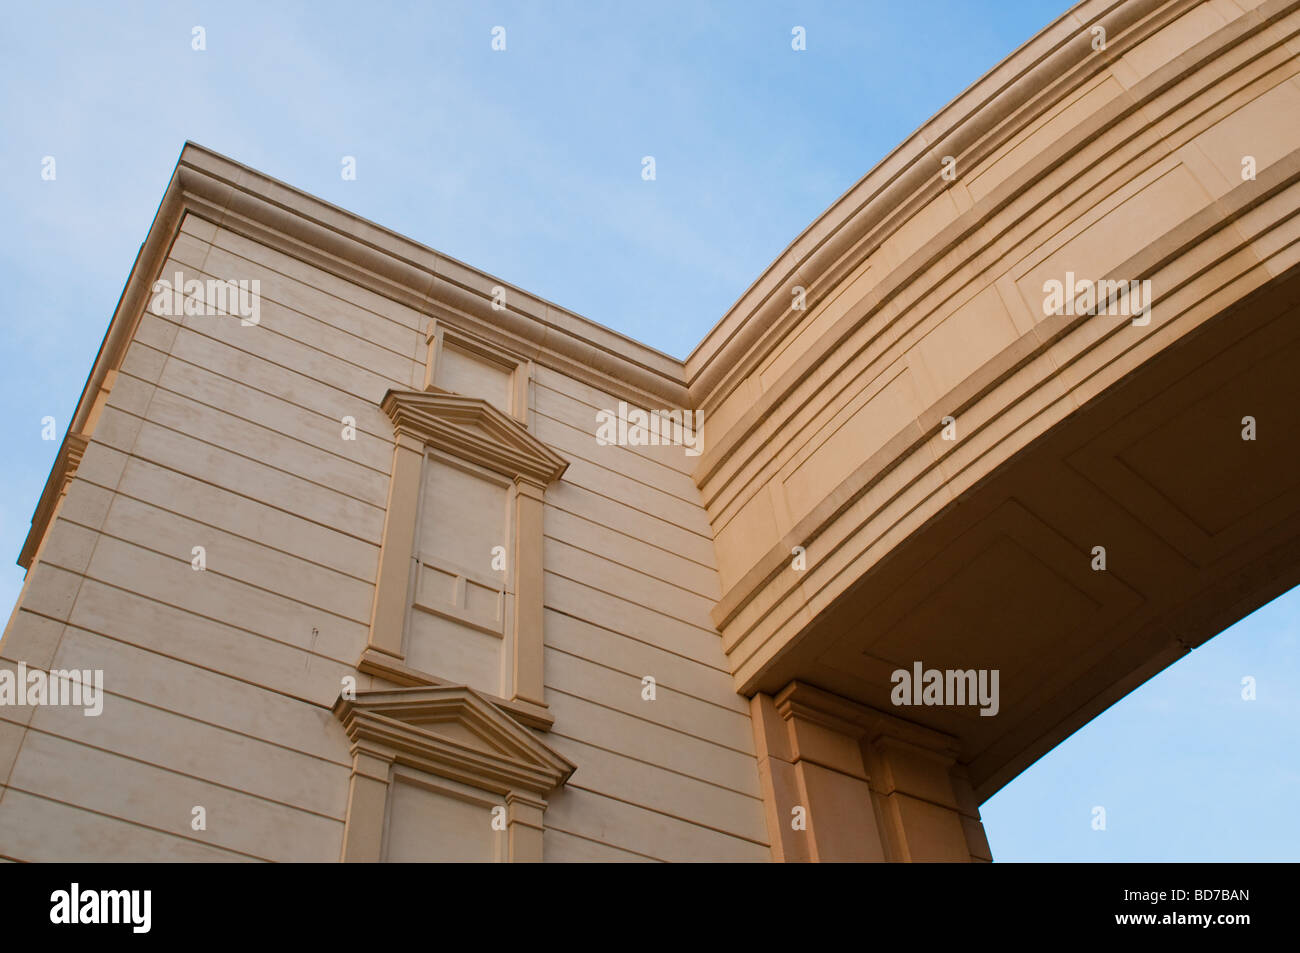 Postmodern stockfotos postmodern bilder alamy - Postmoderne architektur ...